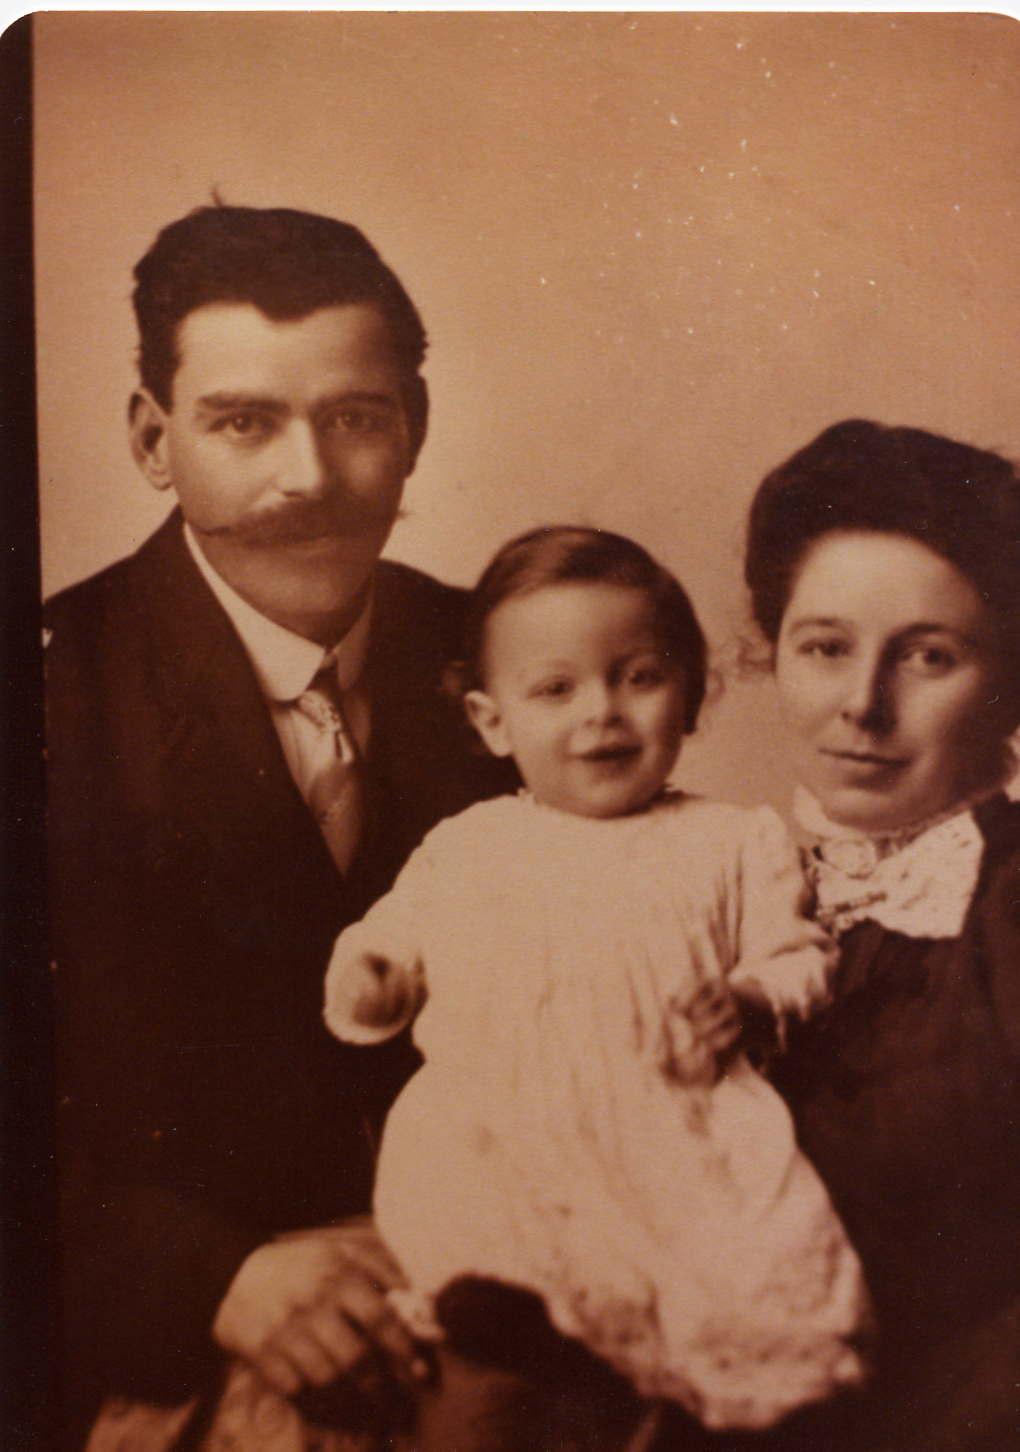 Omar Gearhart, Gertrude Perkins & John Douglas Gearhart